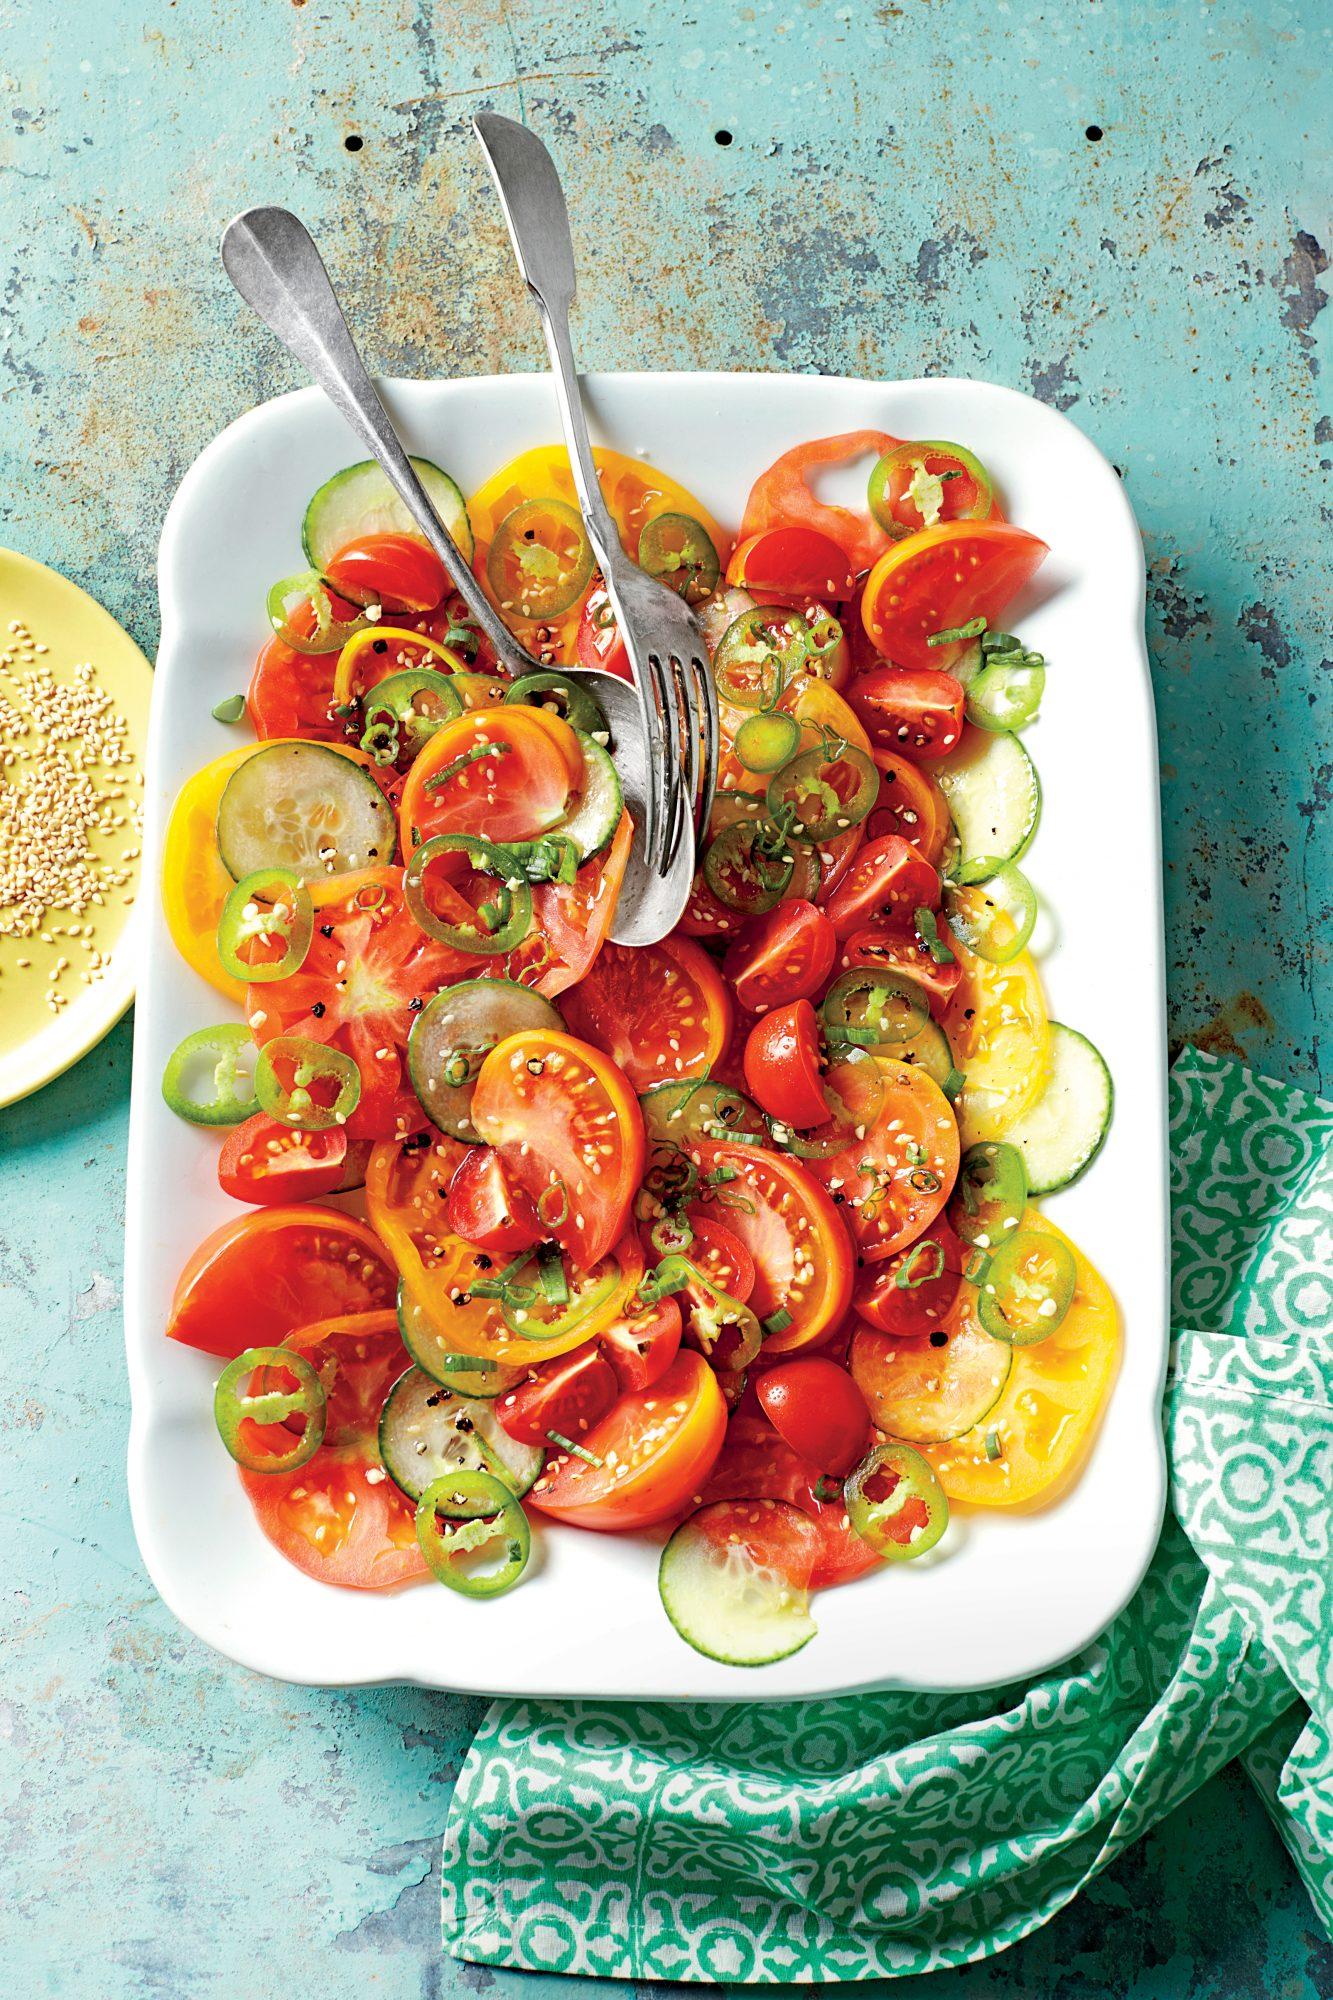 Sesame, Tomato, and Cucumber Salad